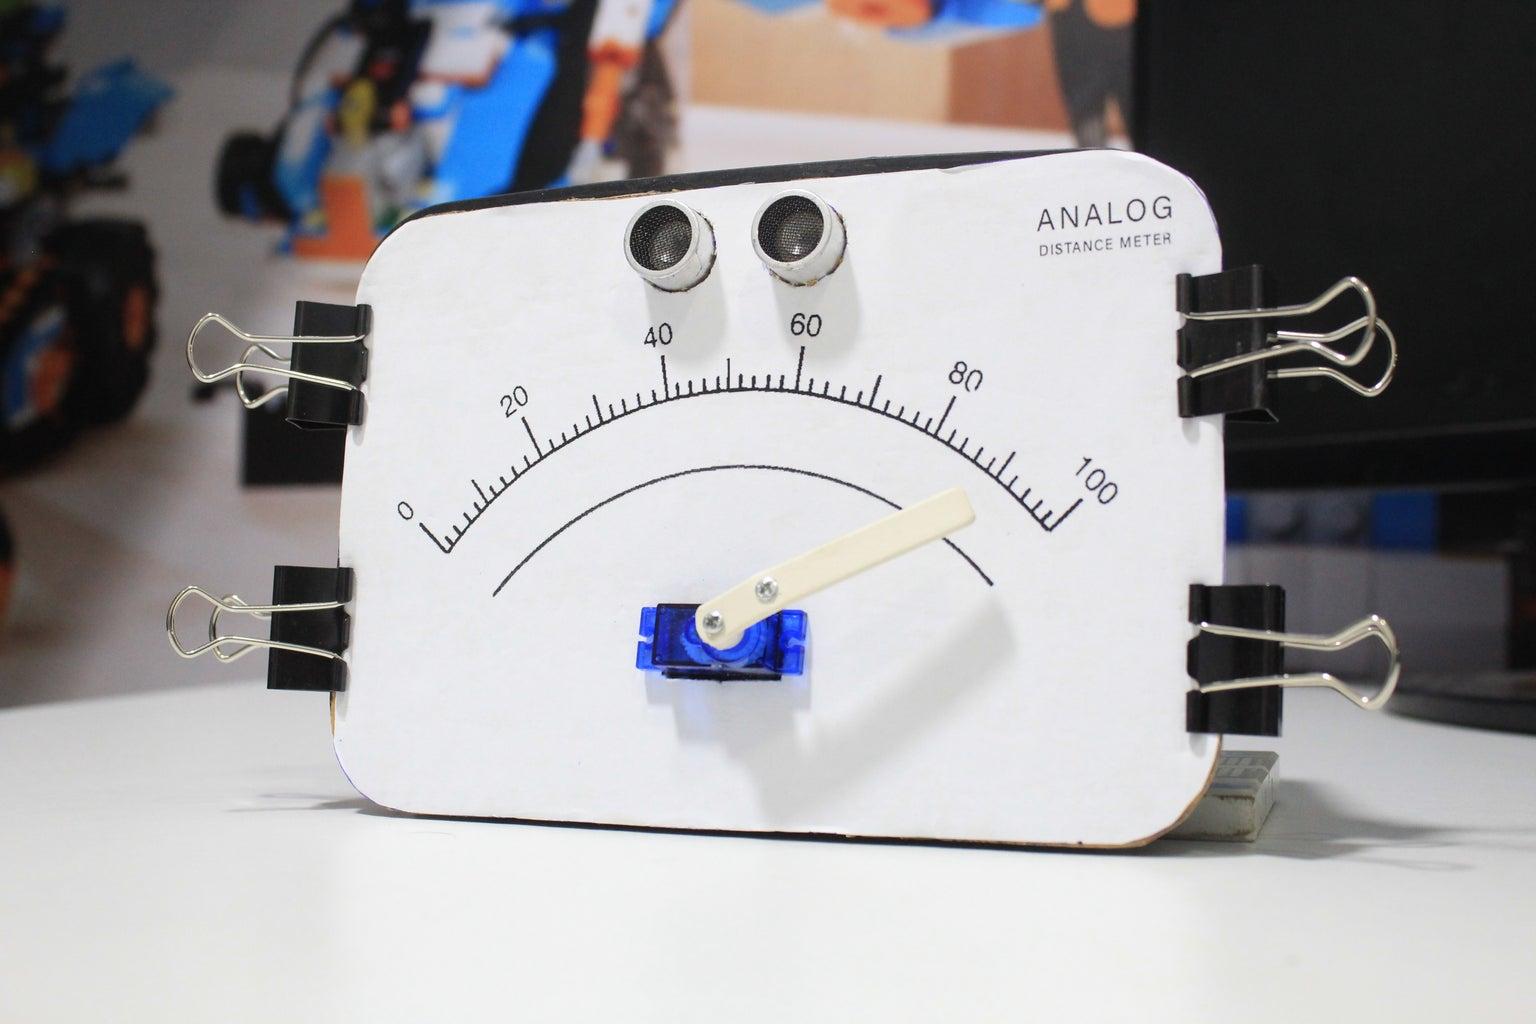 Analog Distance Measuring Meter Using Arduino & Ultrasonic Sensor